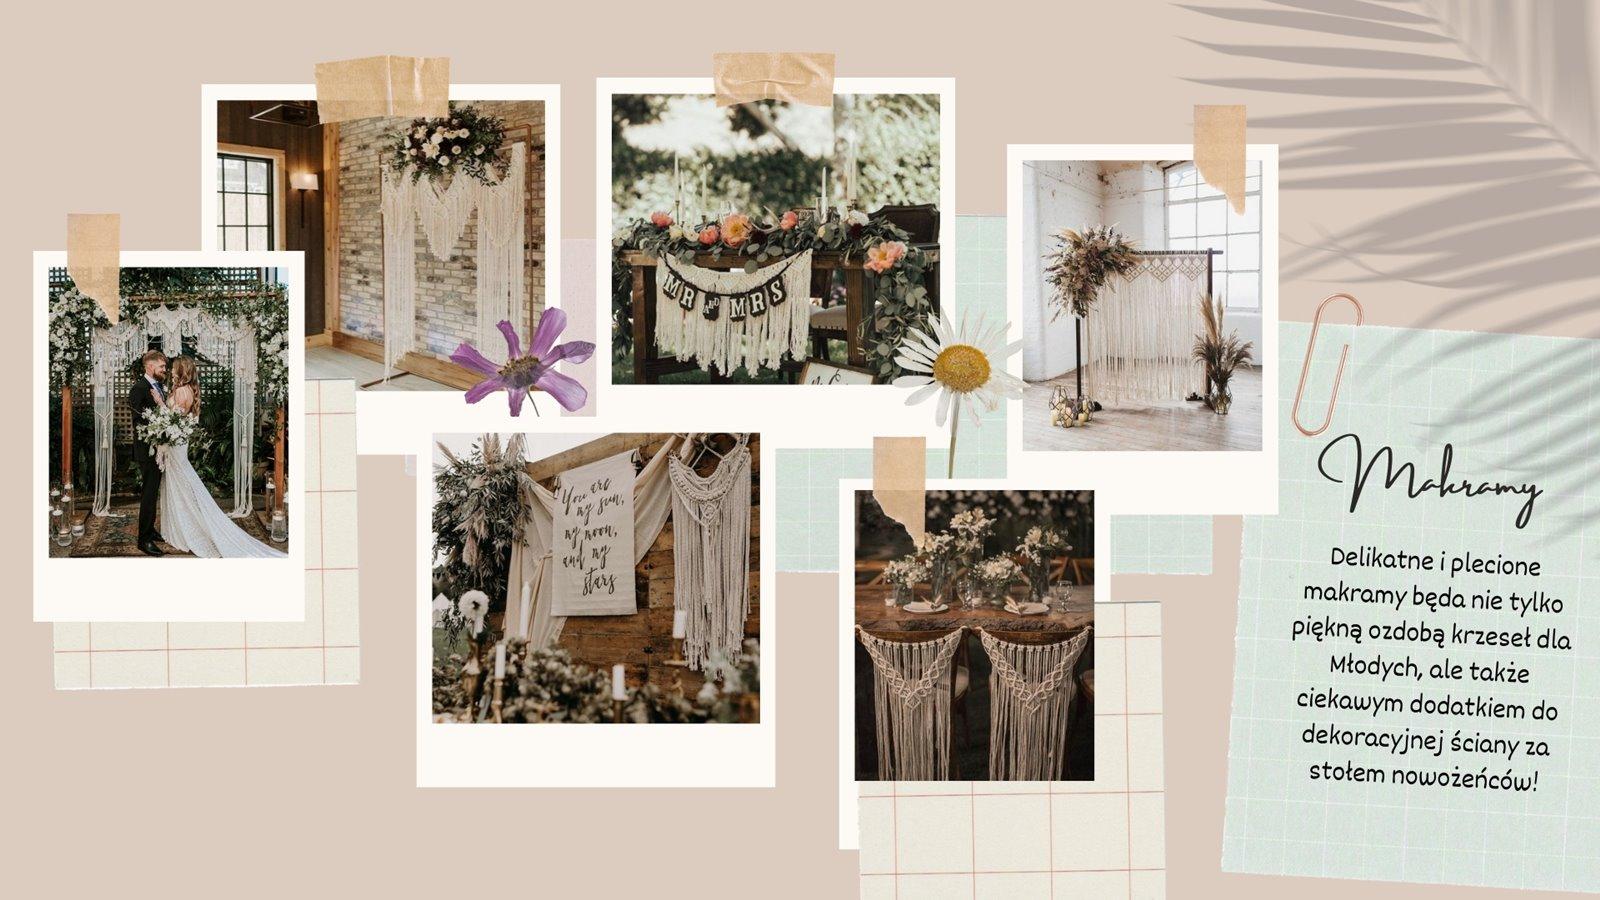 6 dekoracje za stolem panstwa mlodych pomysly na scianki za parą młodą diy jak tanio ubrac sale weselna diy pomysly inspo